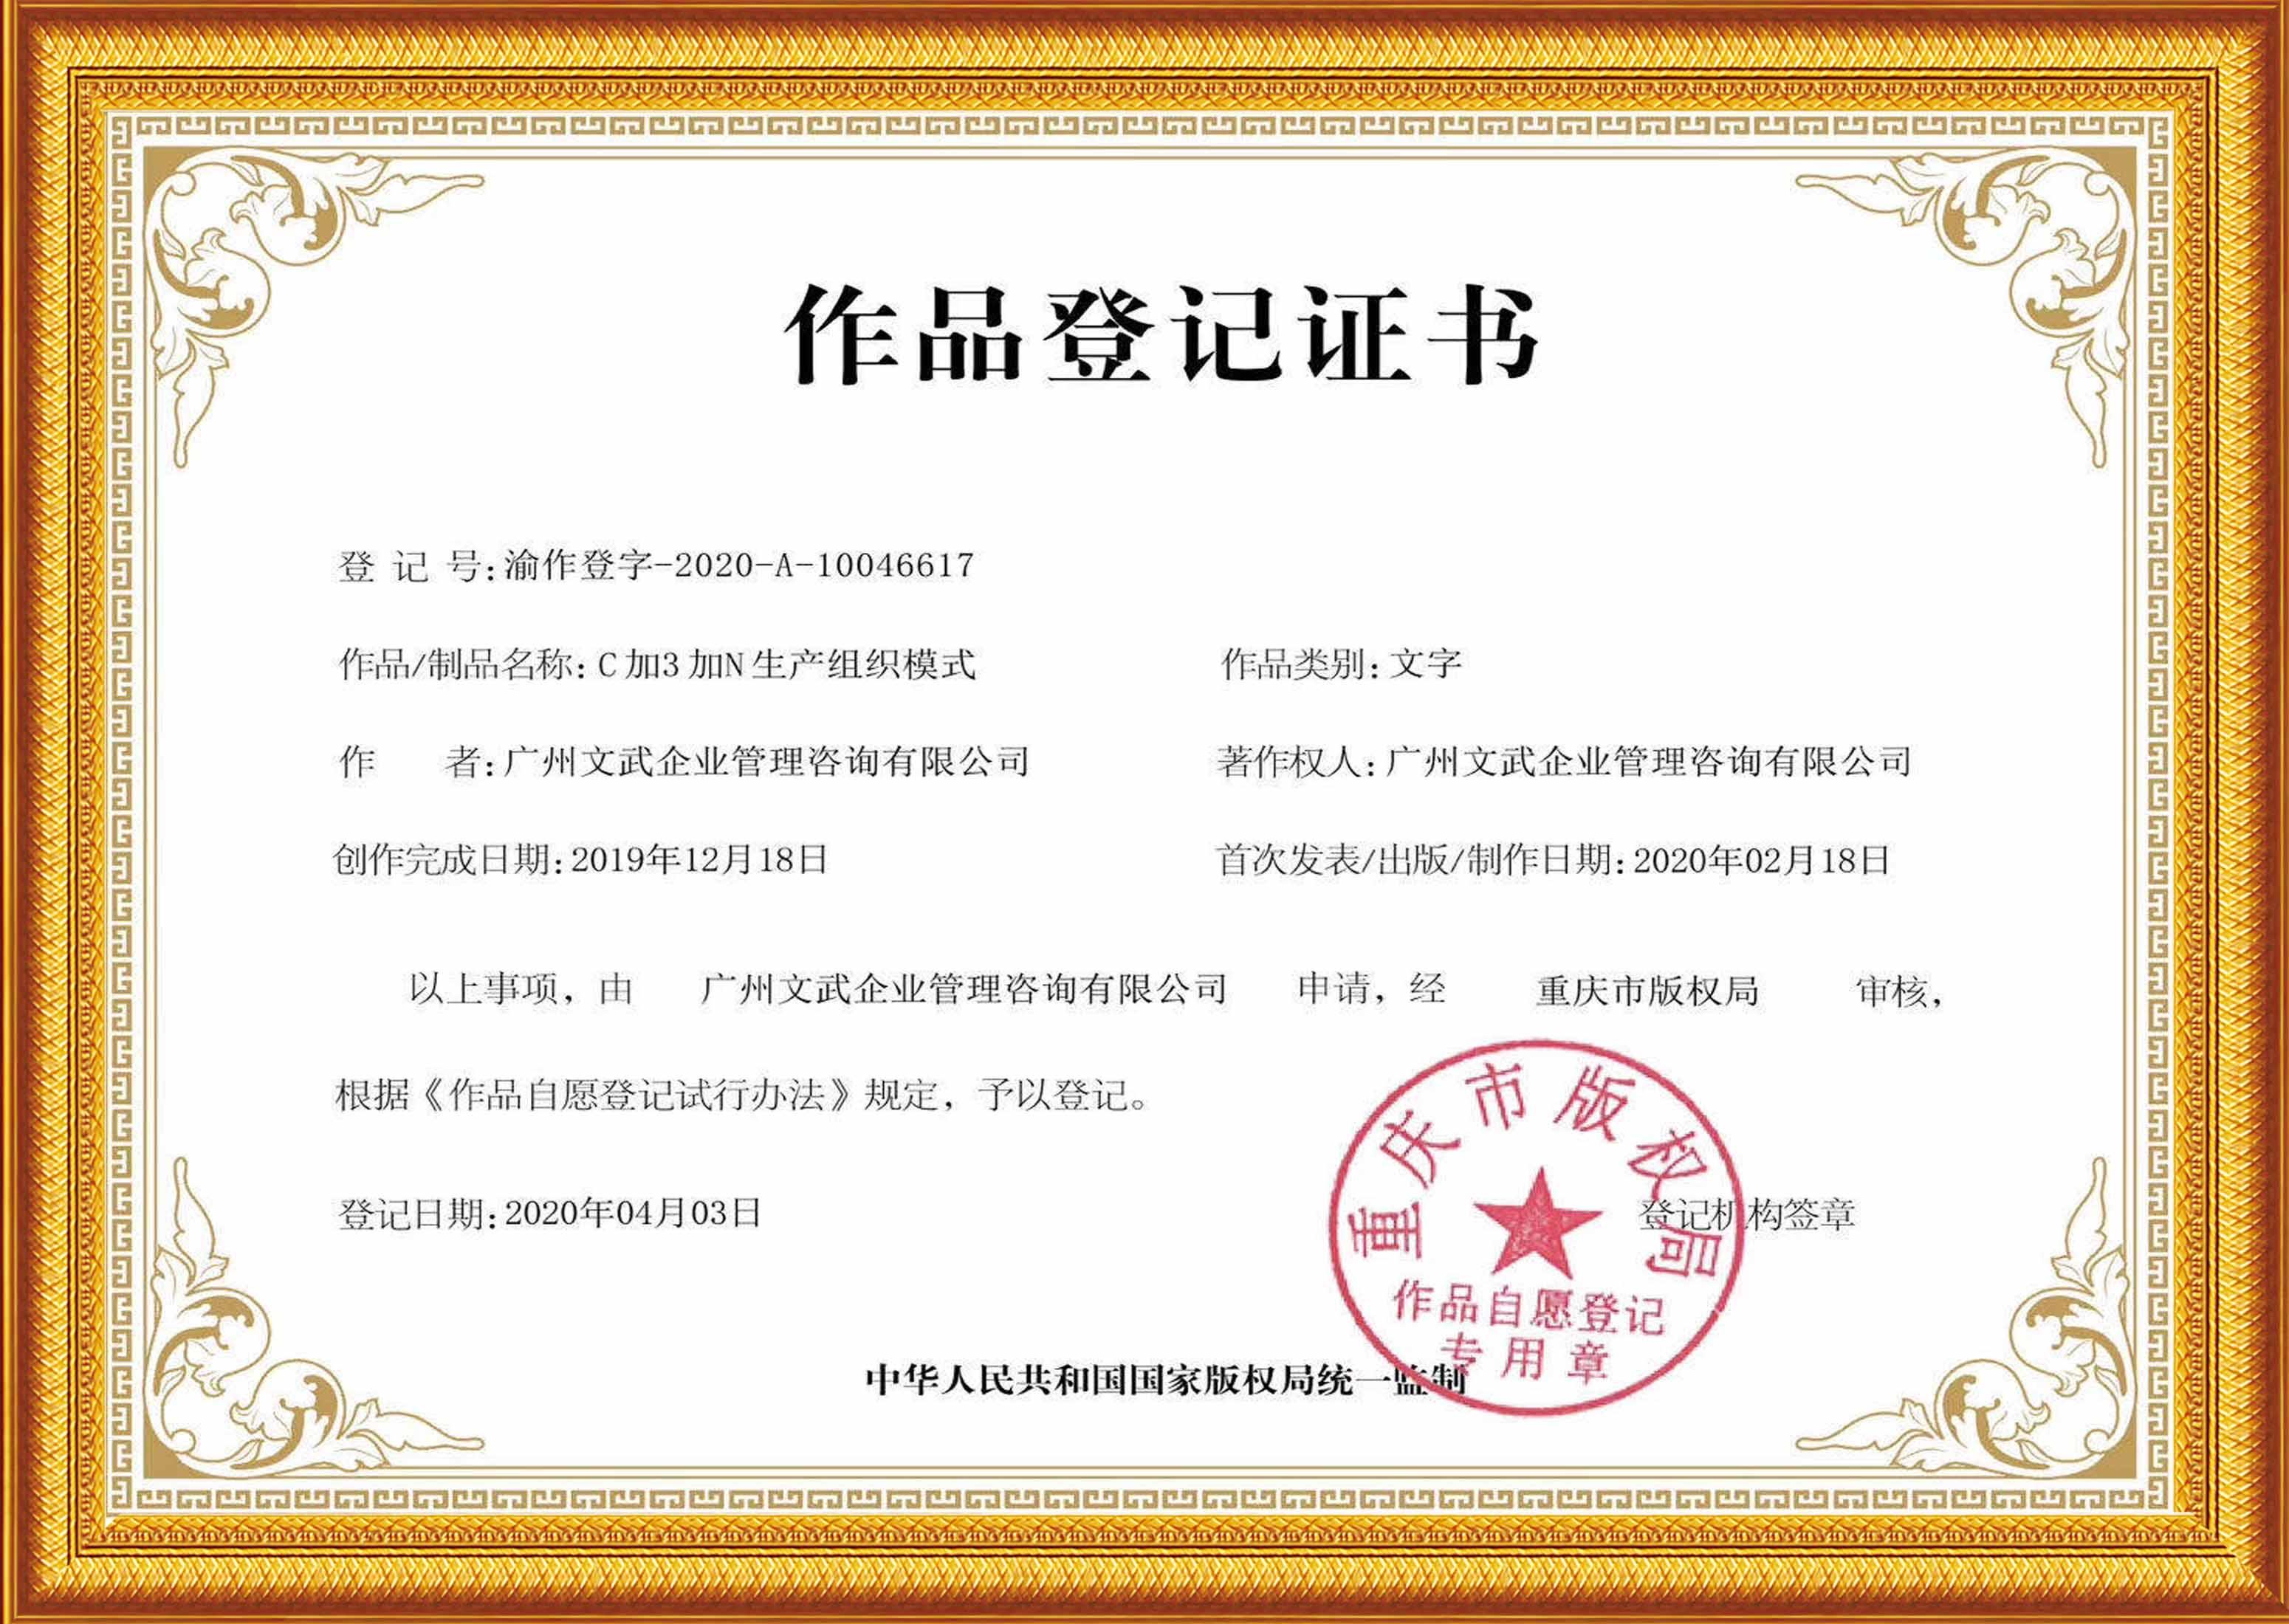 C+3+N生产组织模式作品登记书